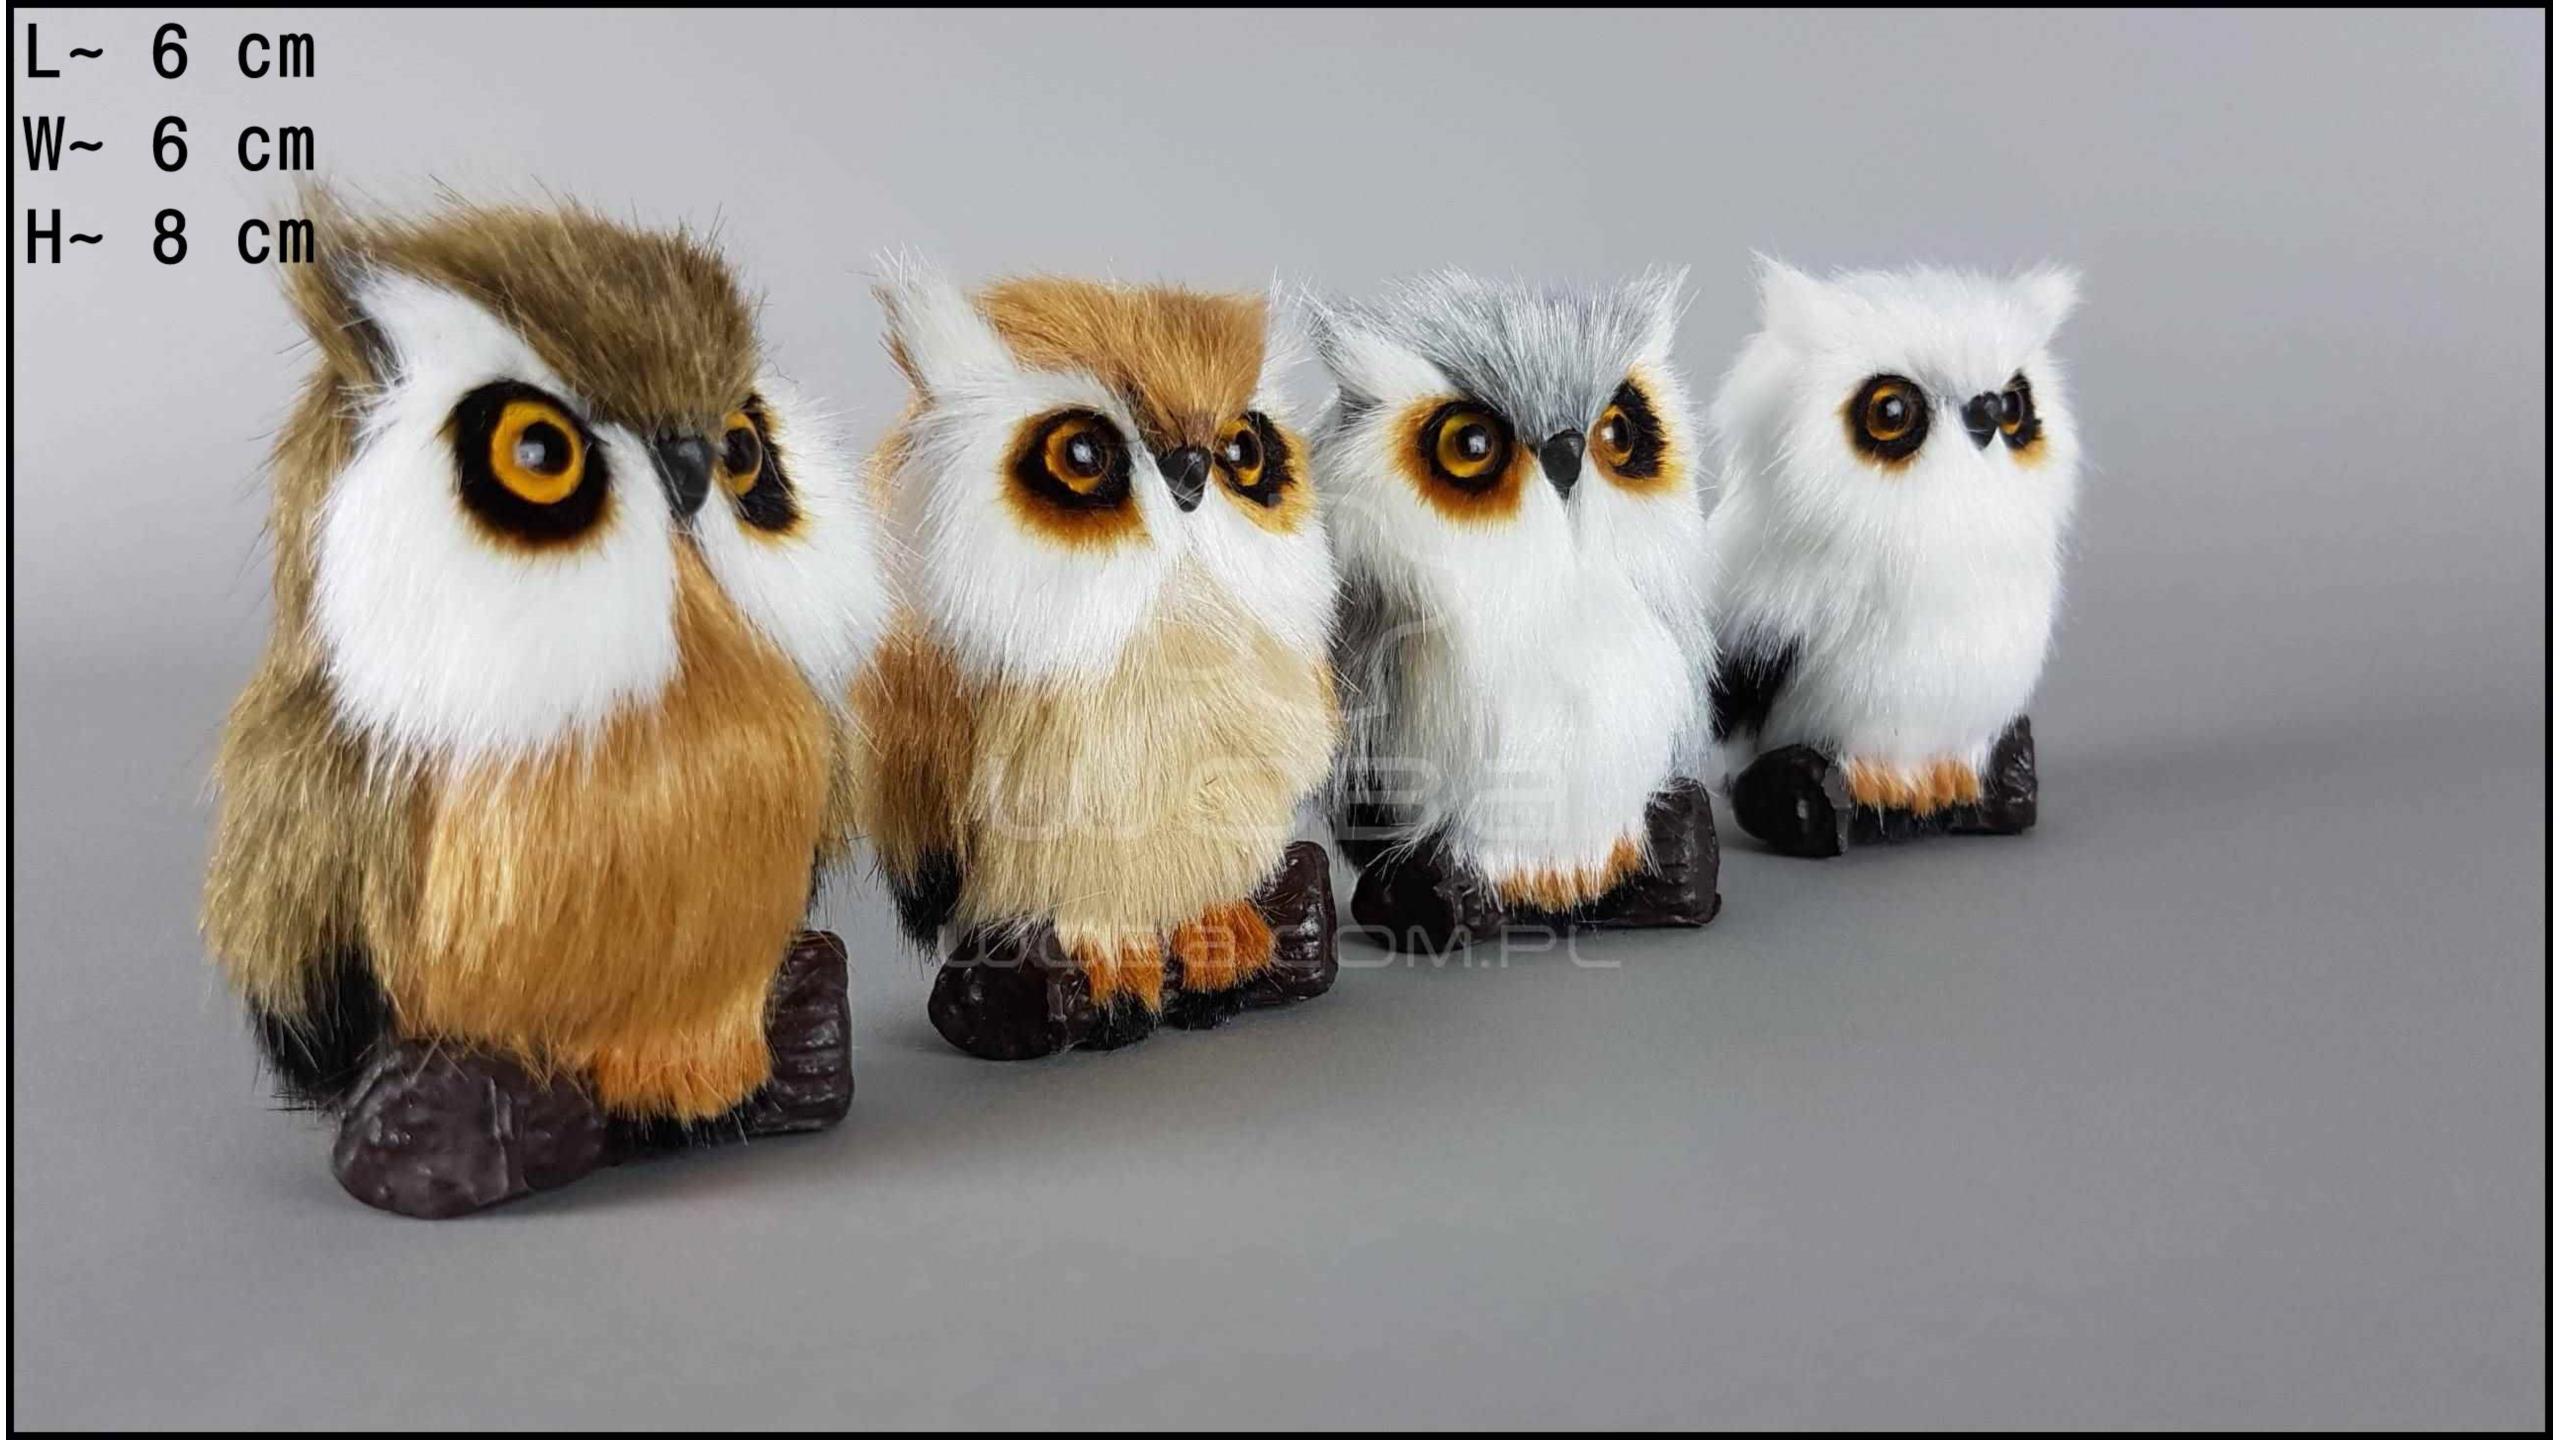 Little owls (4 pcs in a box)